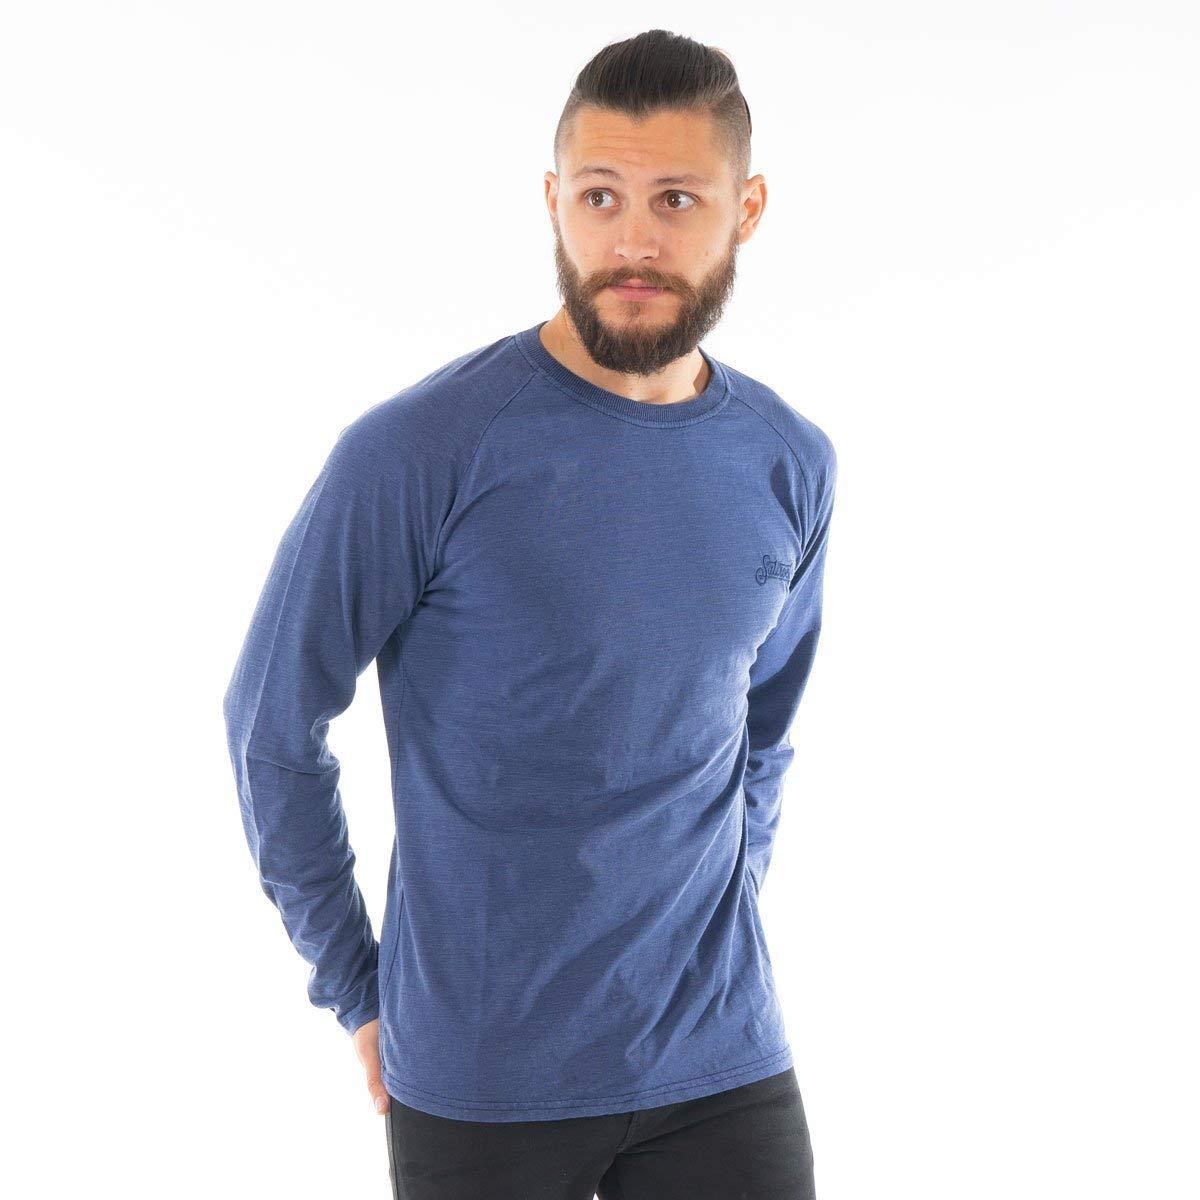 Indo Saltrock Mens Long Sleeve T-Shirt Blue